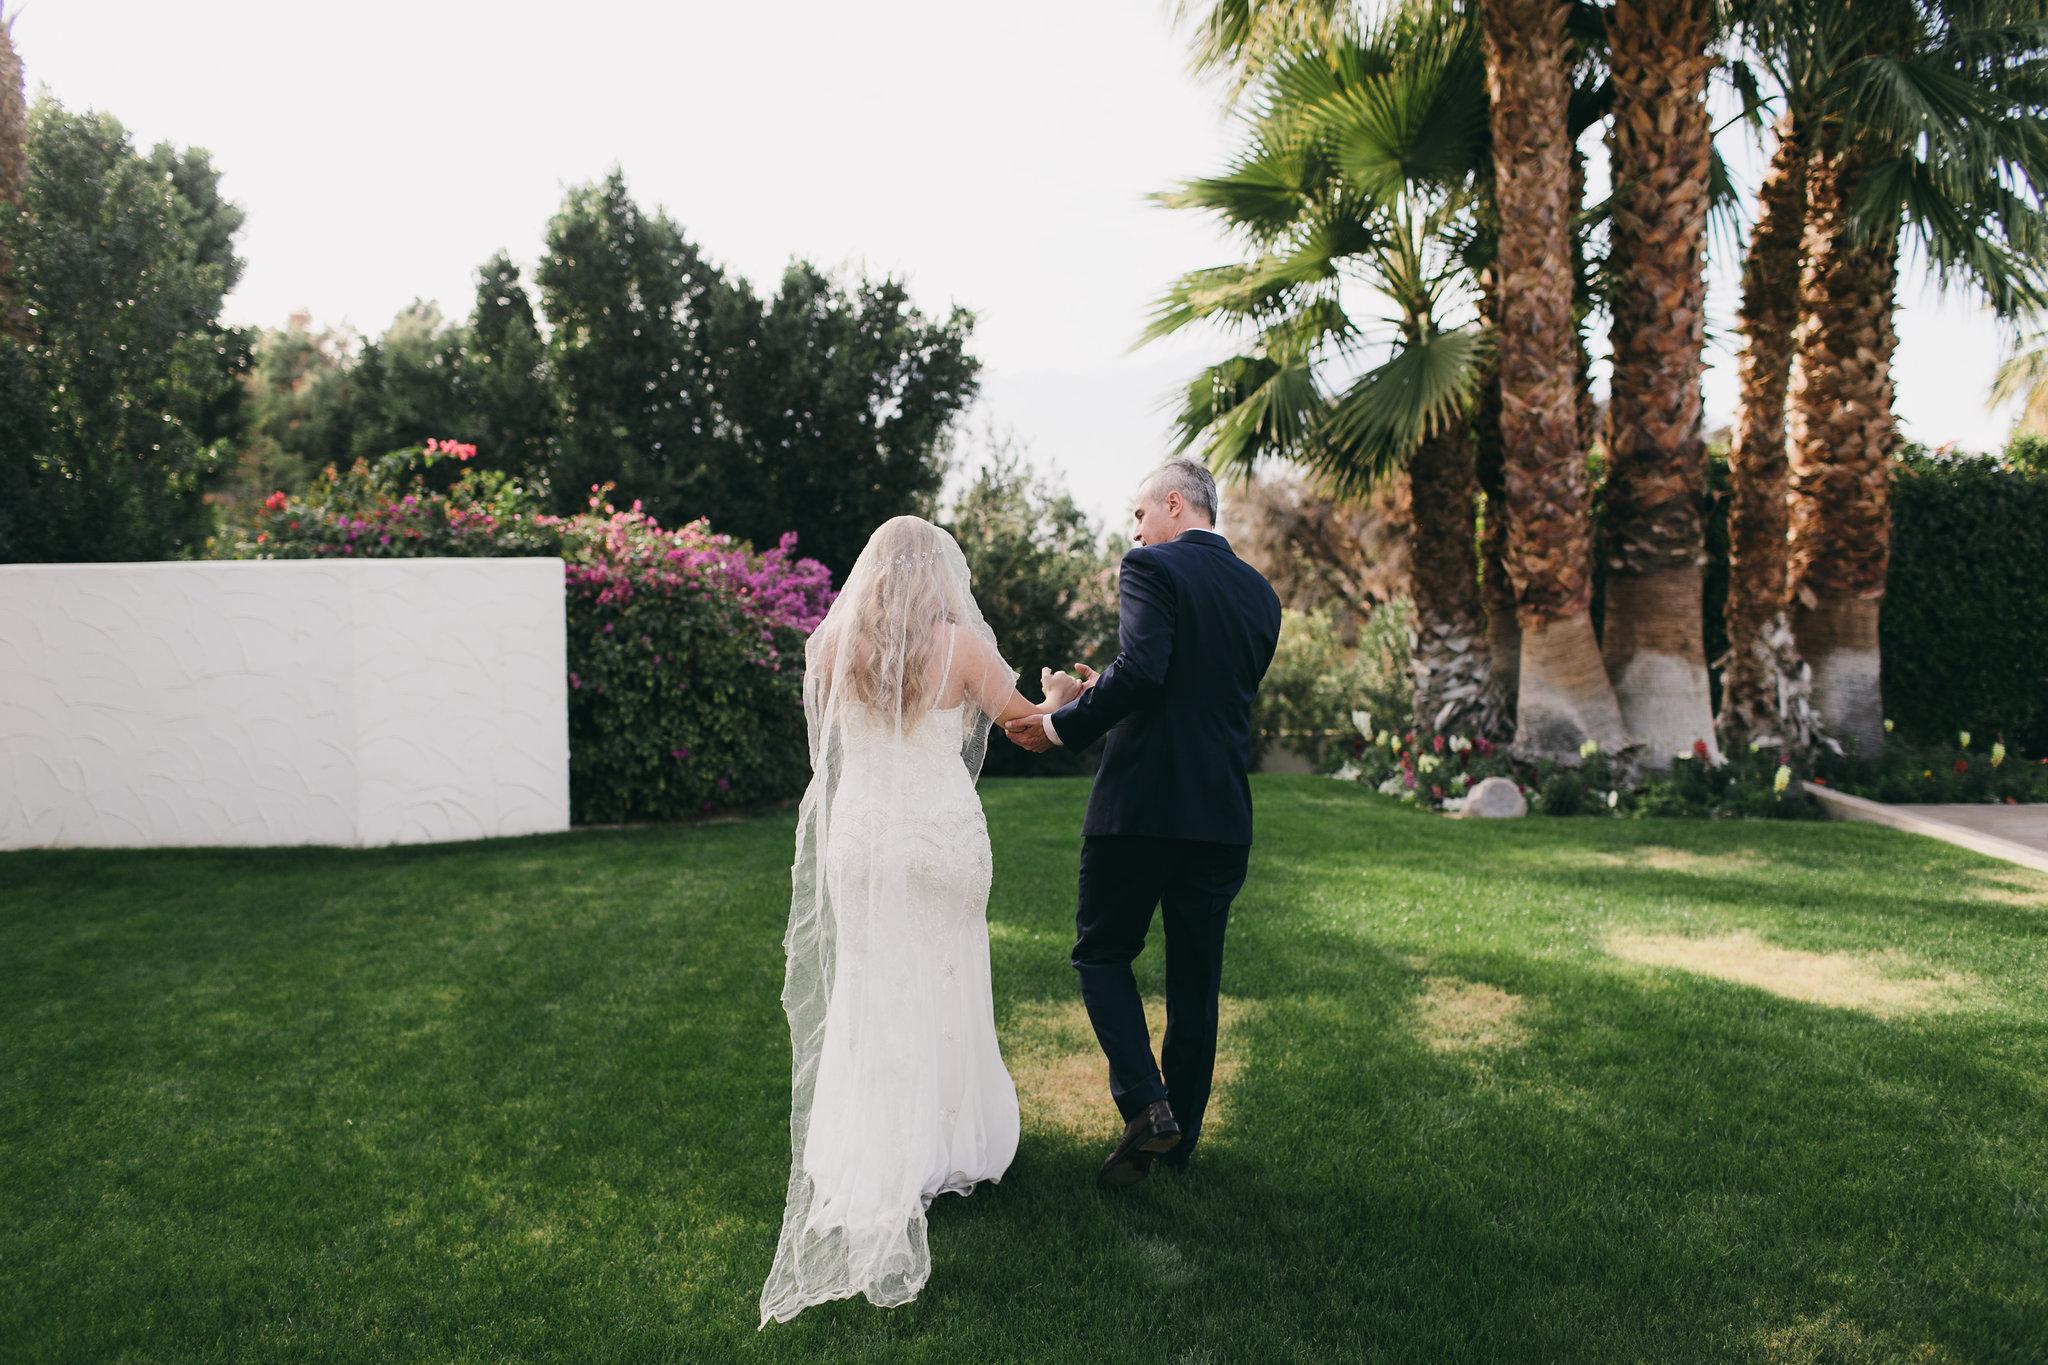 Gracy-Andrew-Wedding-218.jpg